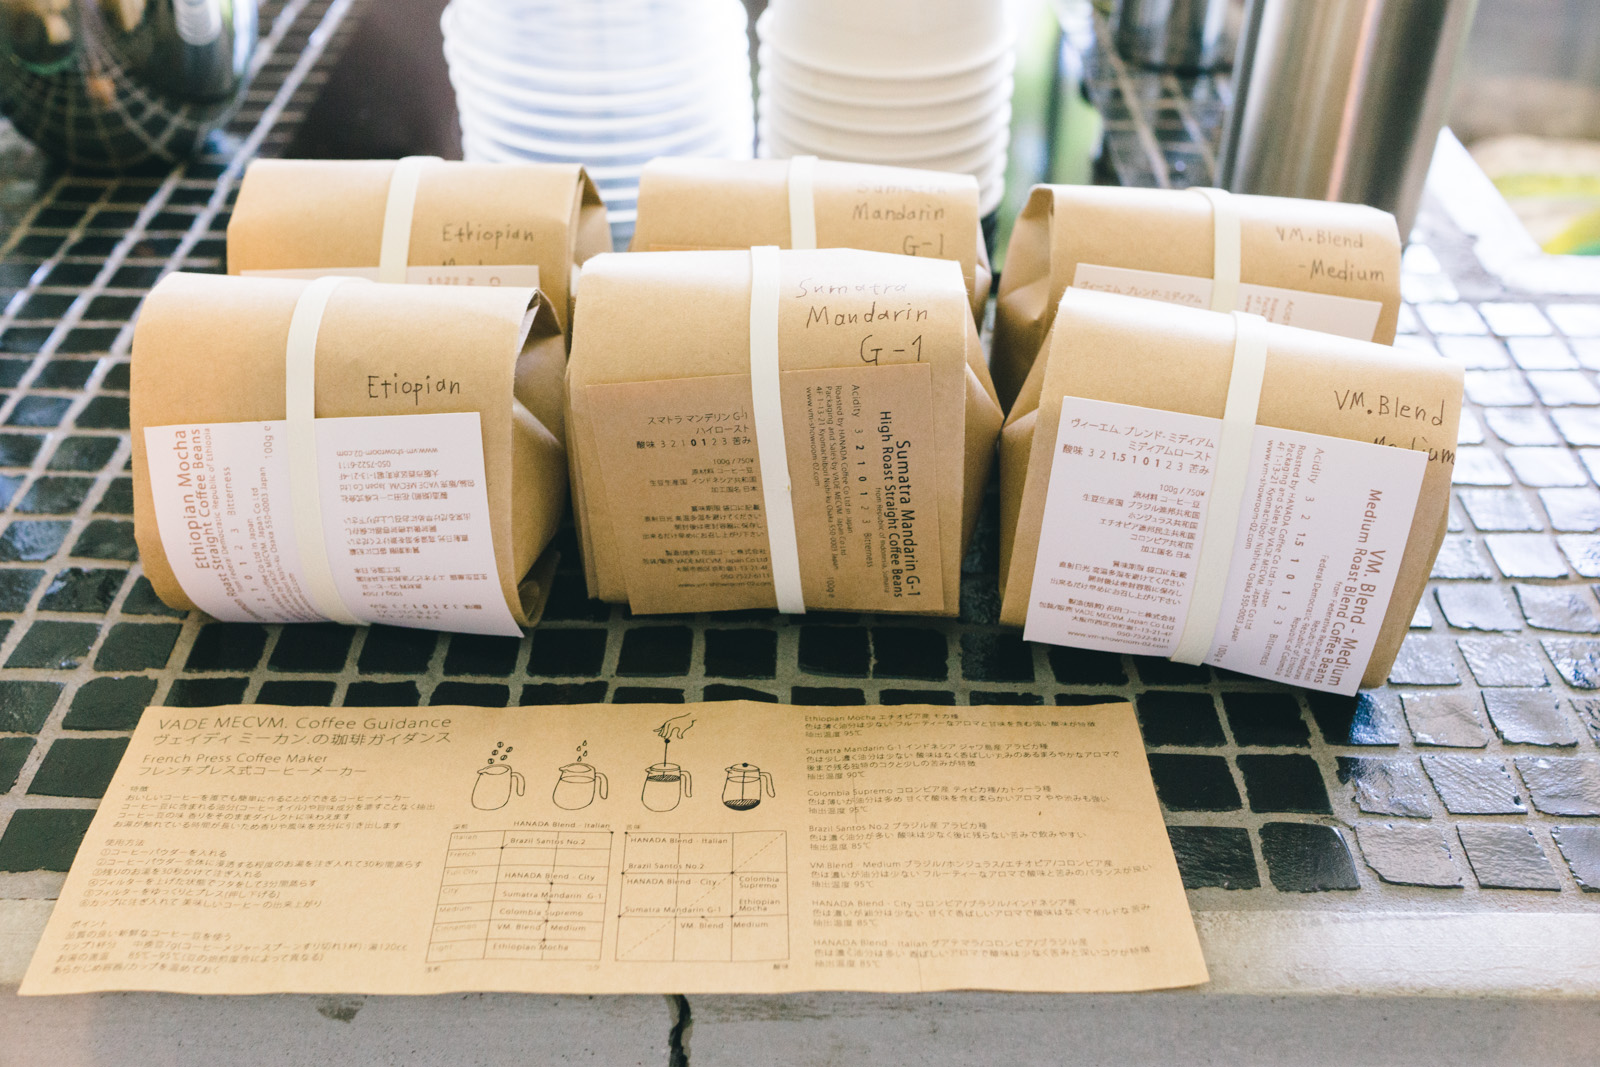 that-food-cray-osaka-japan-vade-vecvm-cafe-coffee-shop-3